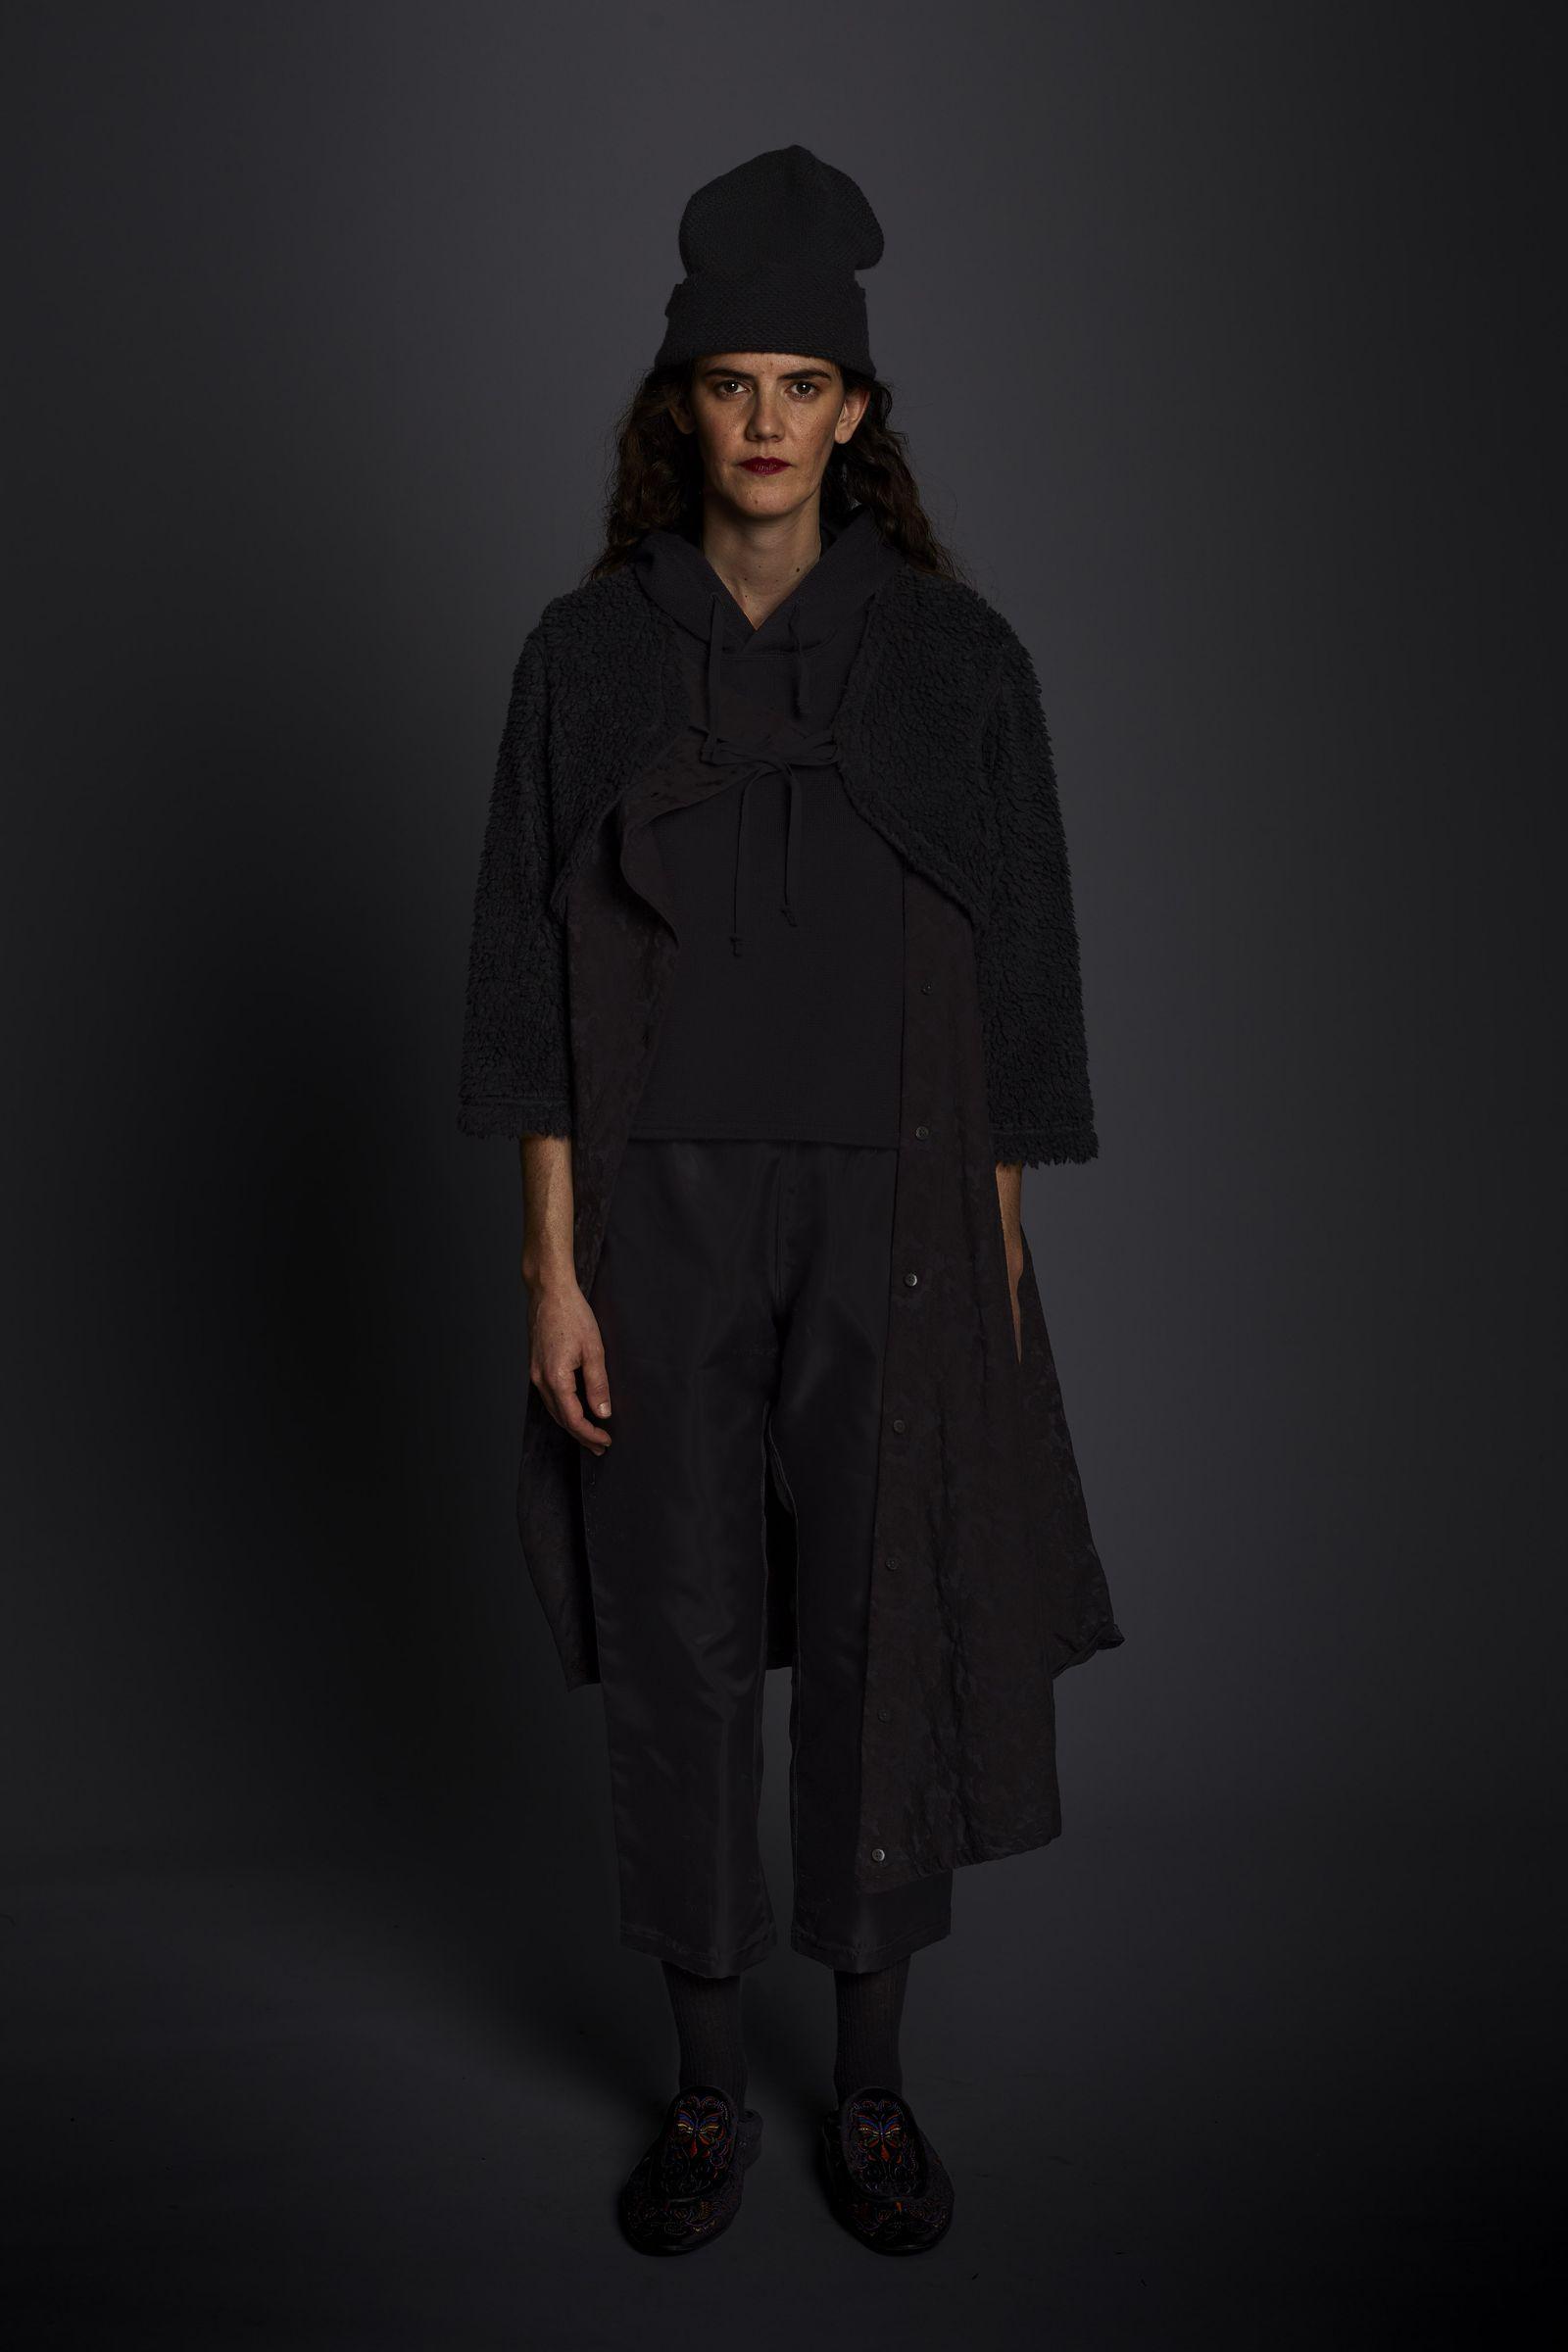 engineered-garments-fall-winter-2020-39